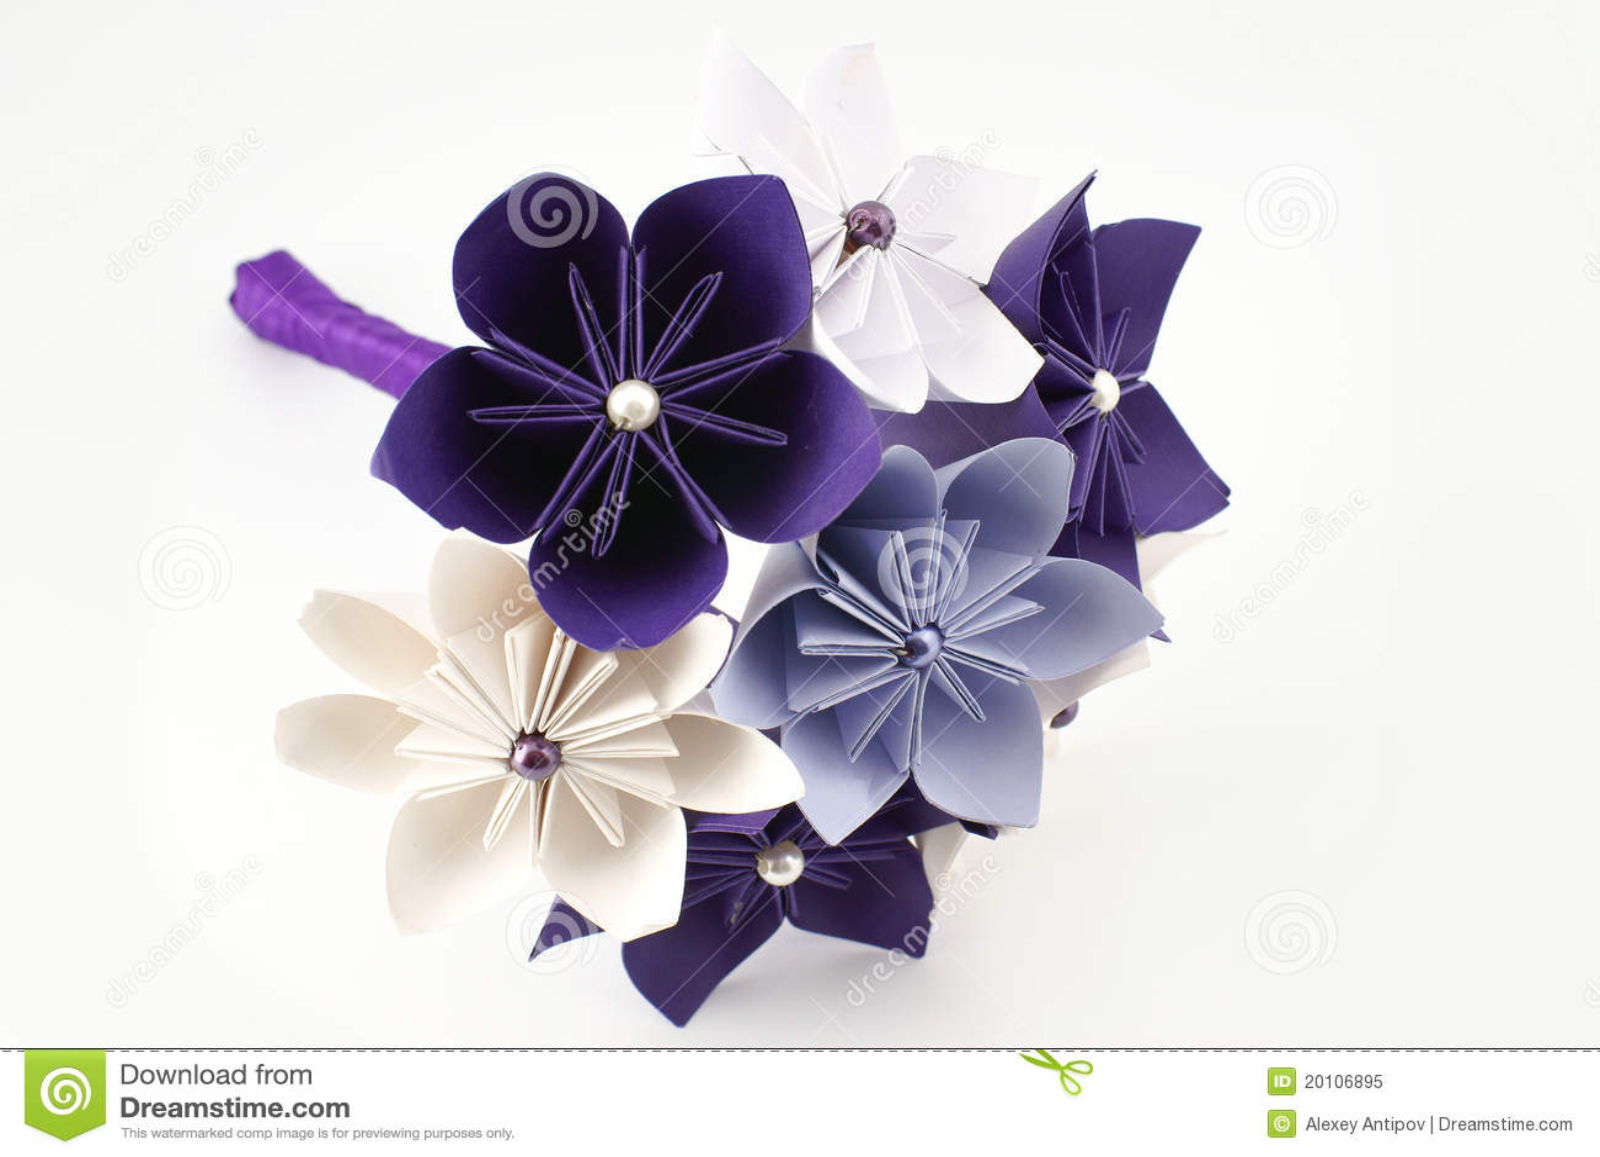 ORIGAMI WEDDING DECORATIONS – Lavender Home | 957x1300